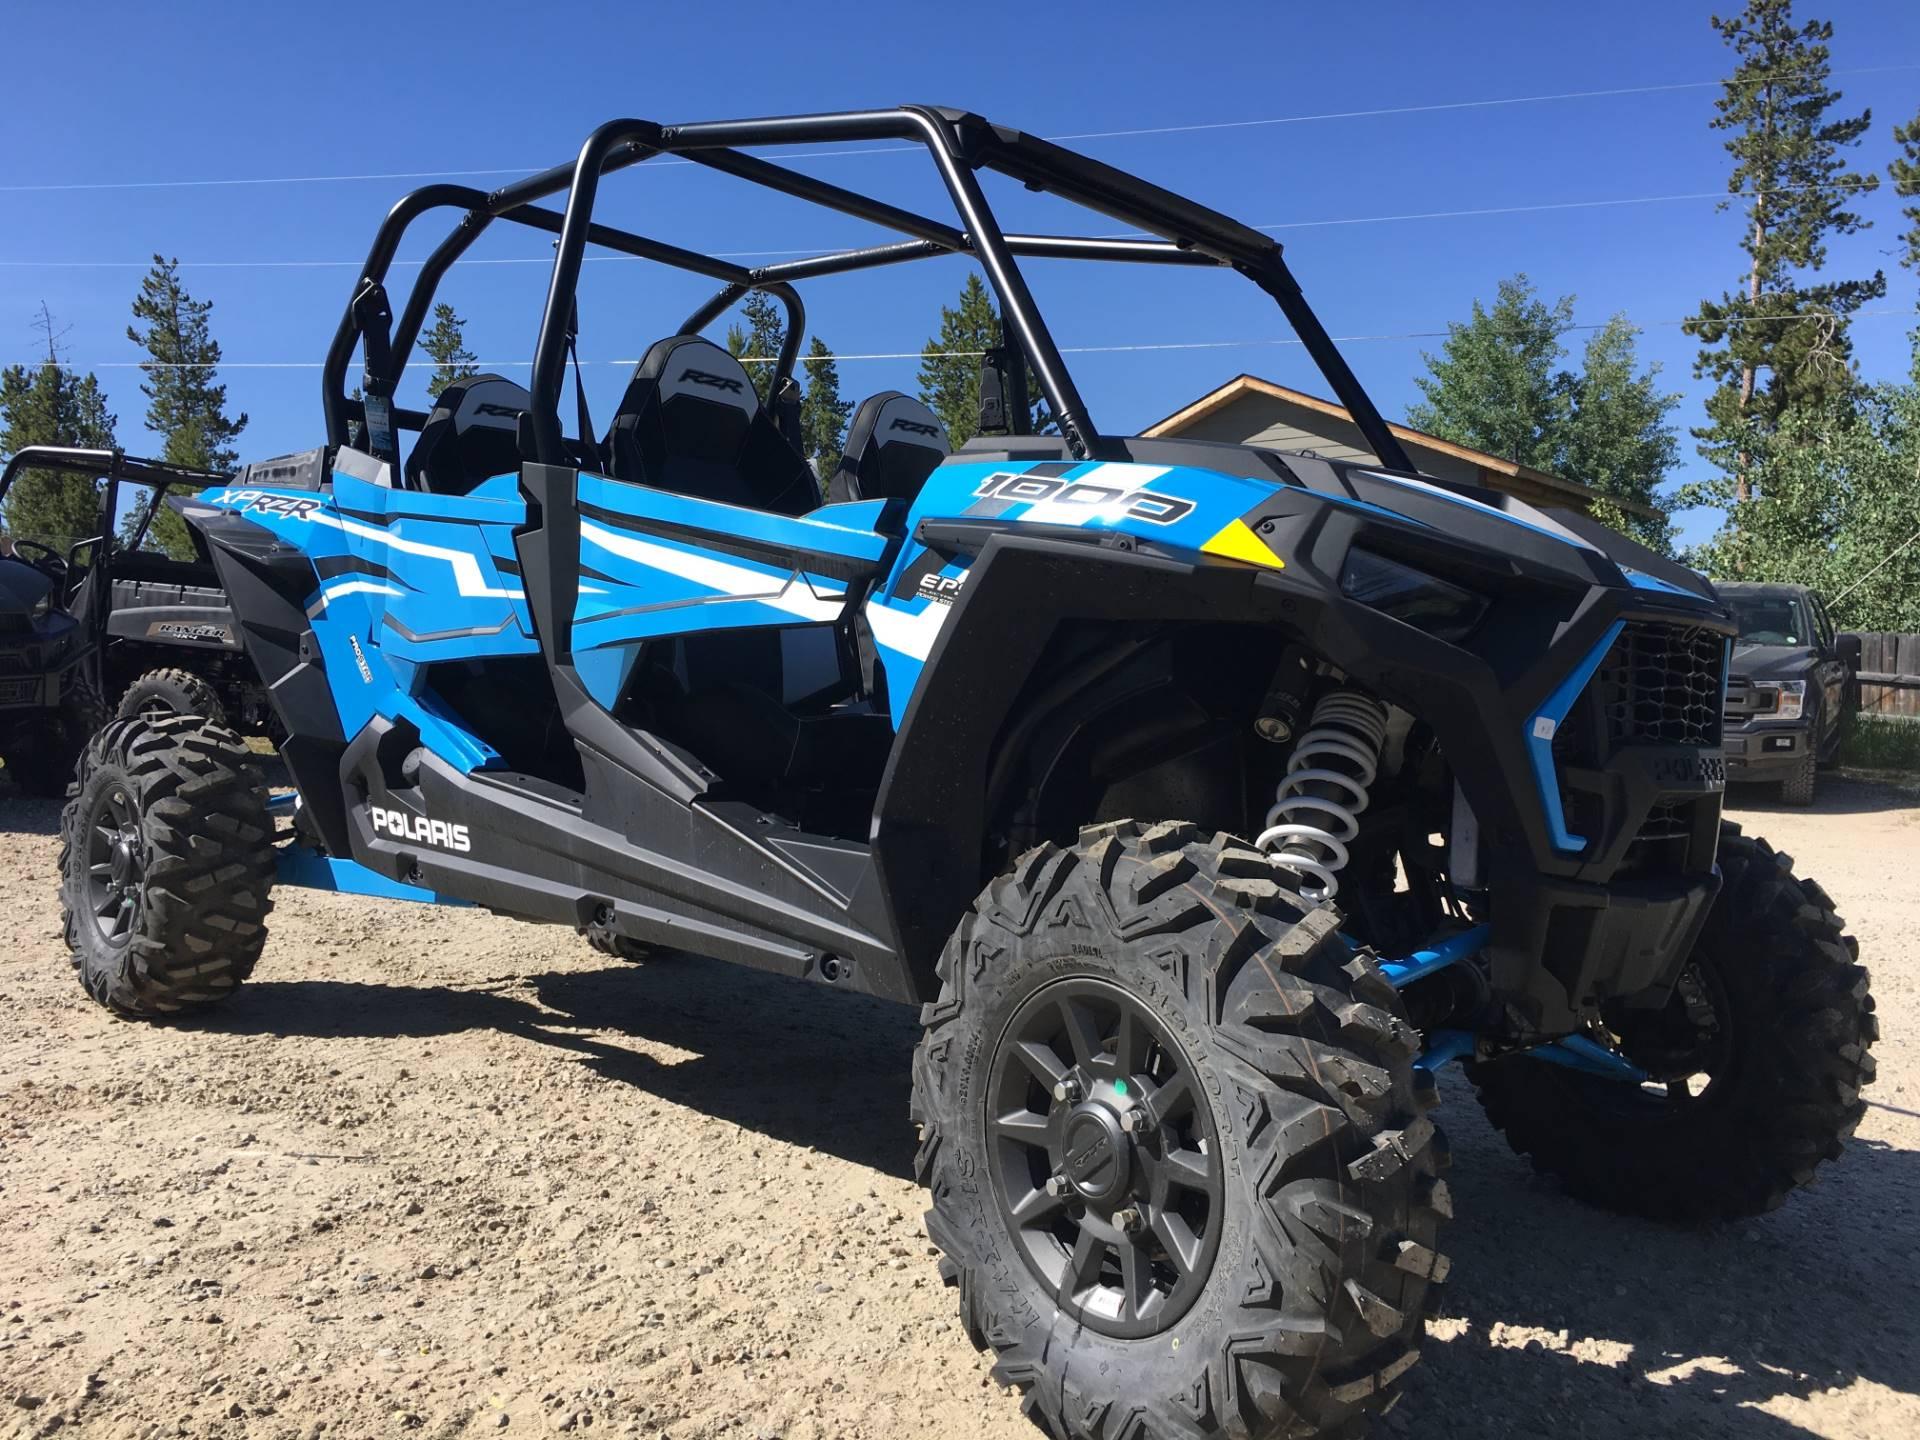 2019 Polaris RZR XP 4 1000 EPS in Grand Lake, Colorado